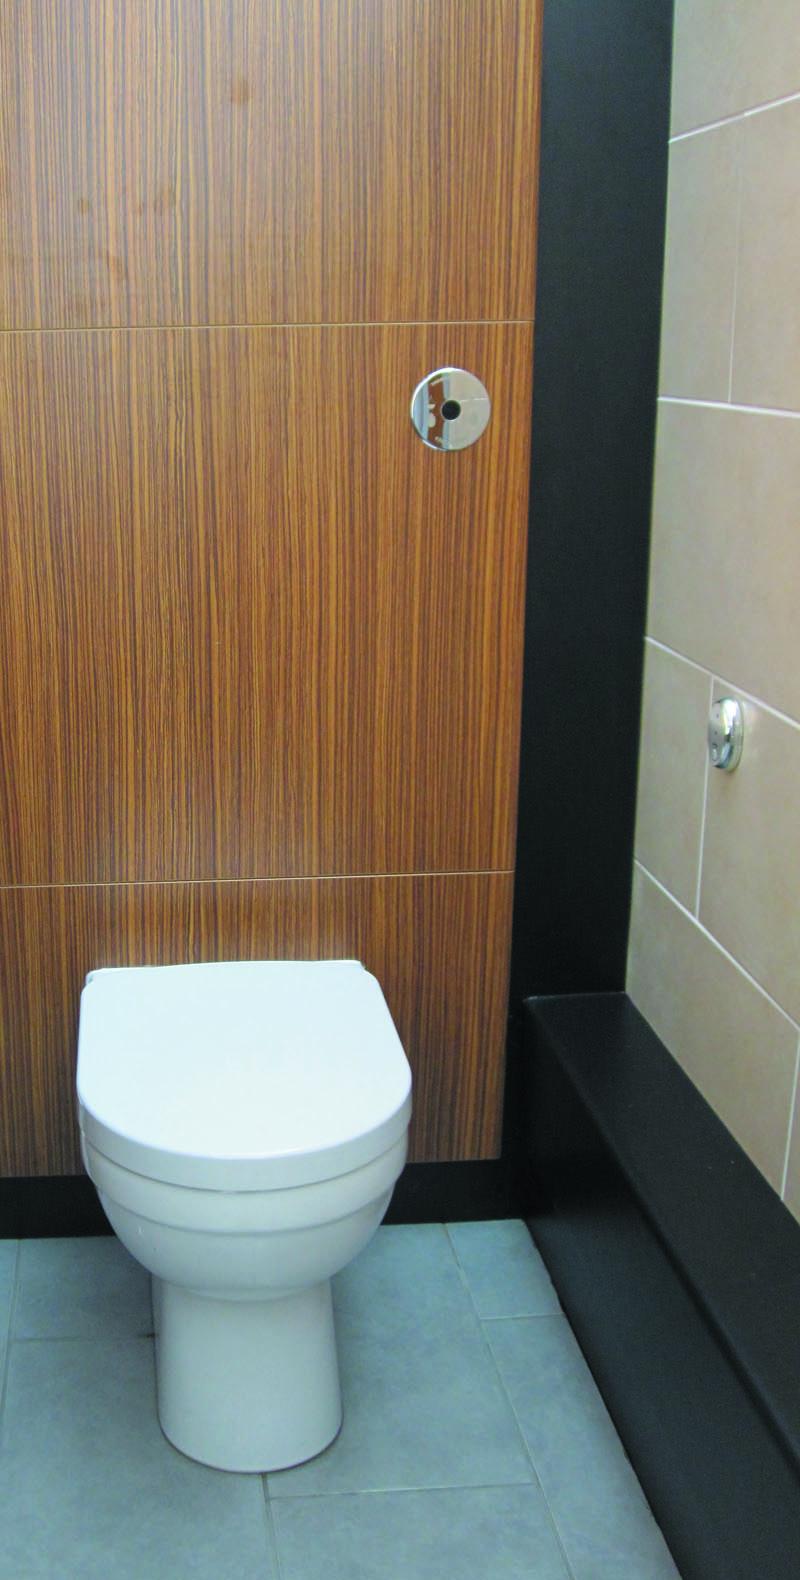 Toilet Electronic Toilet Sensor Flush Toilet Sensor